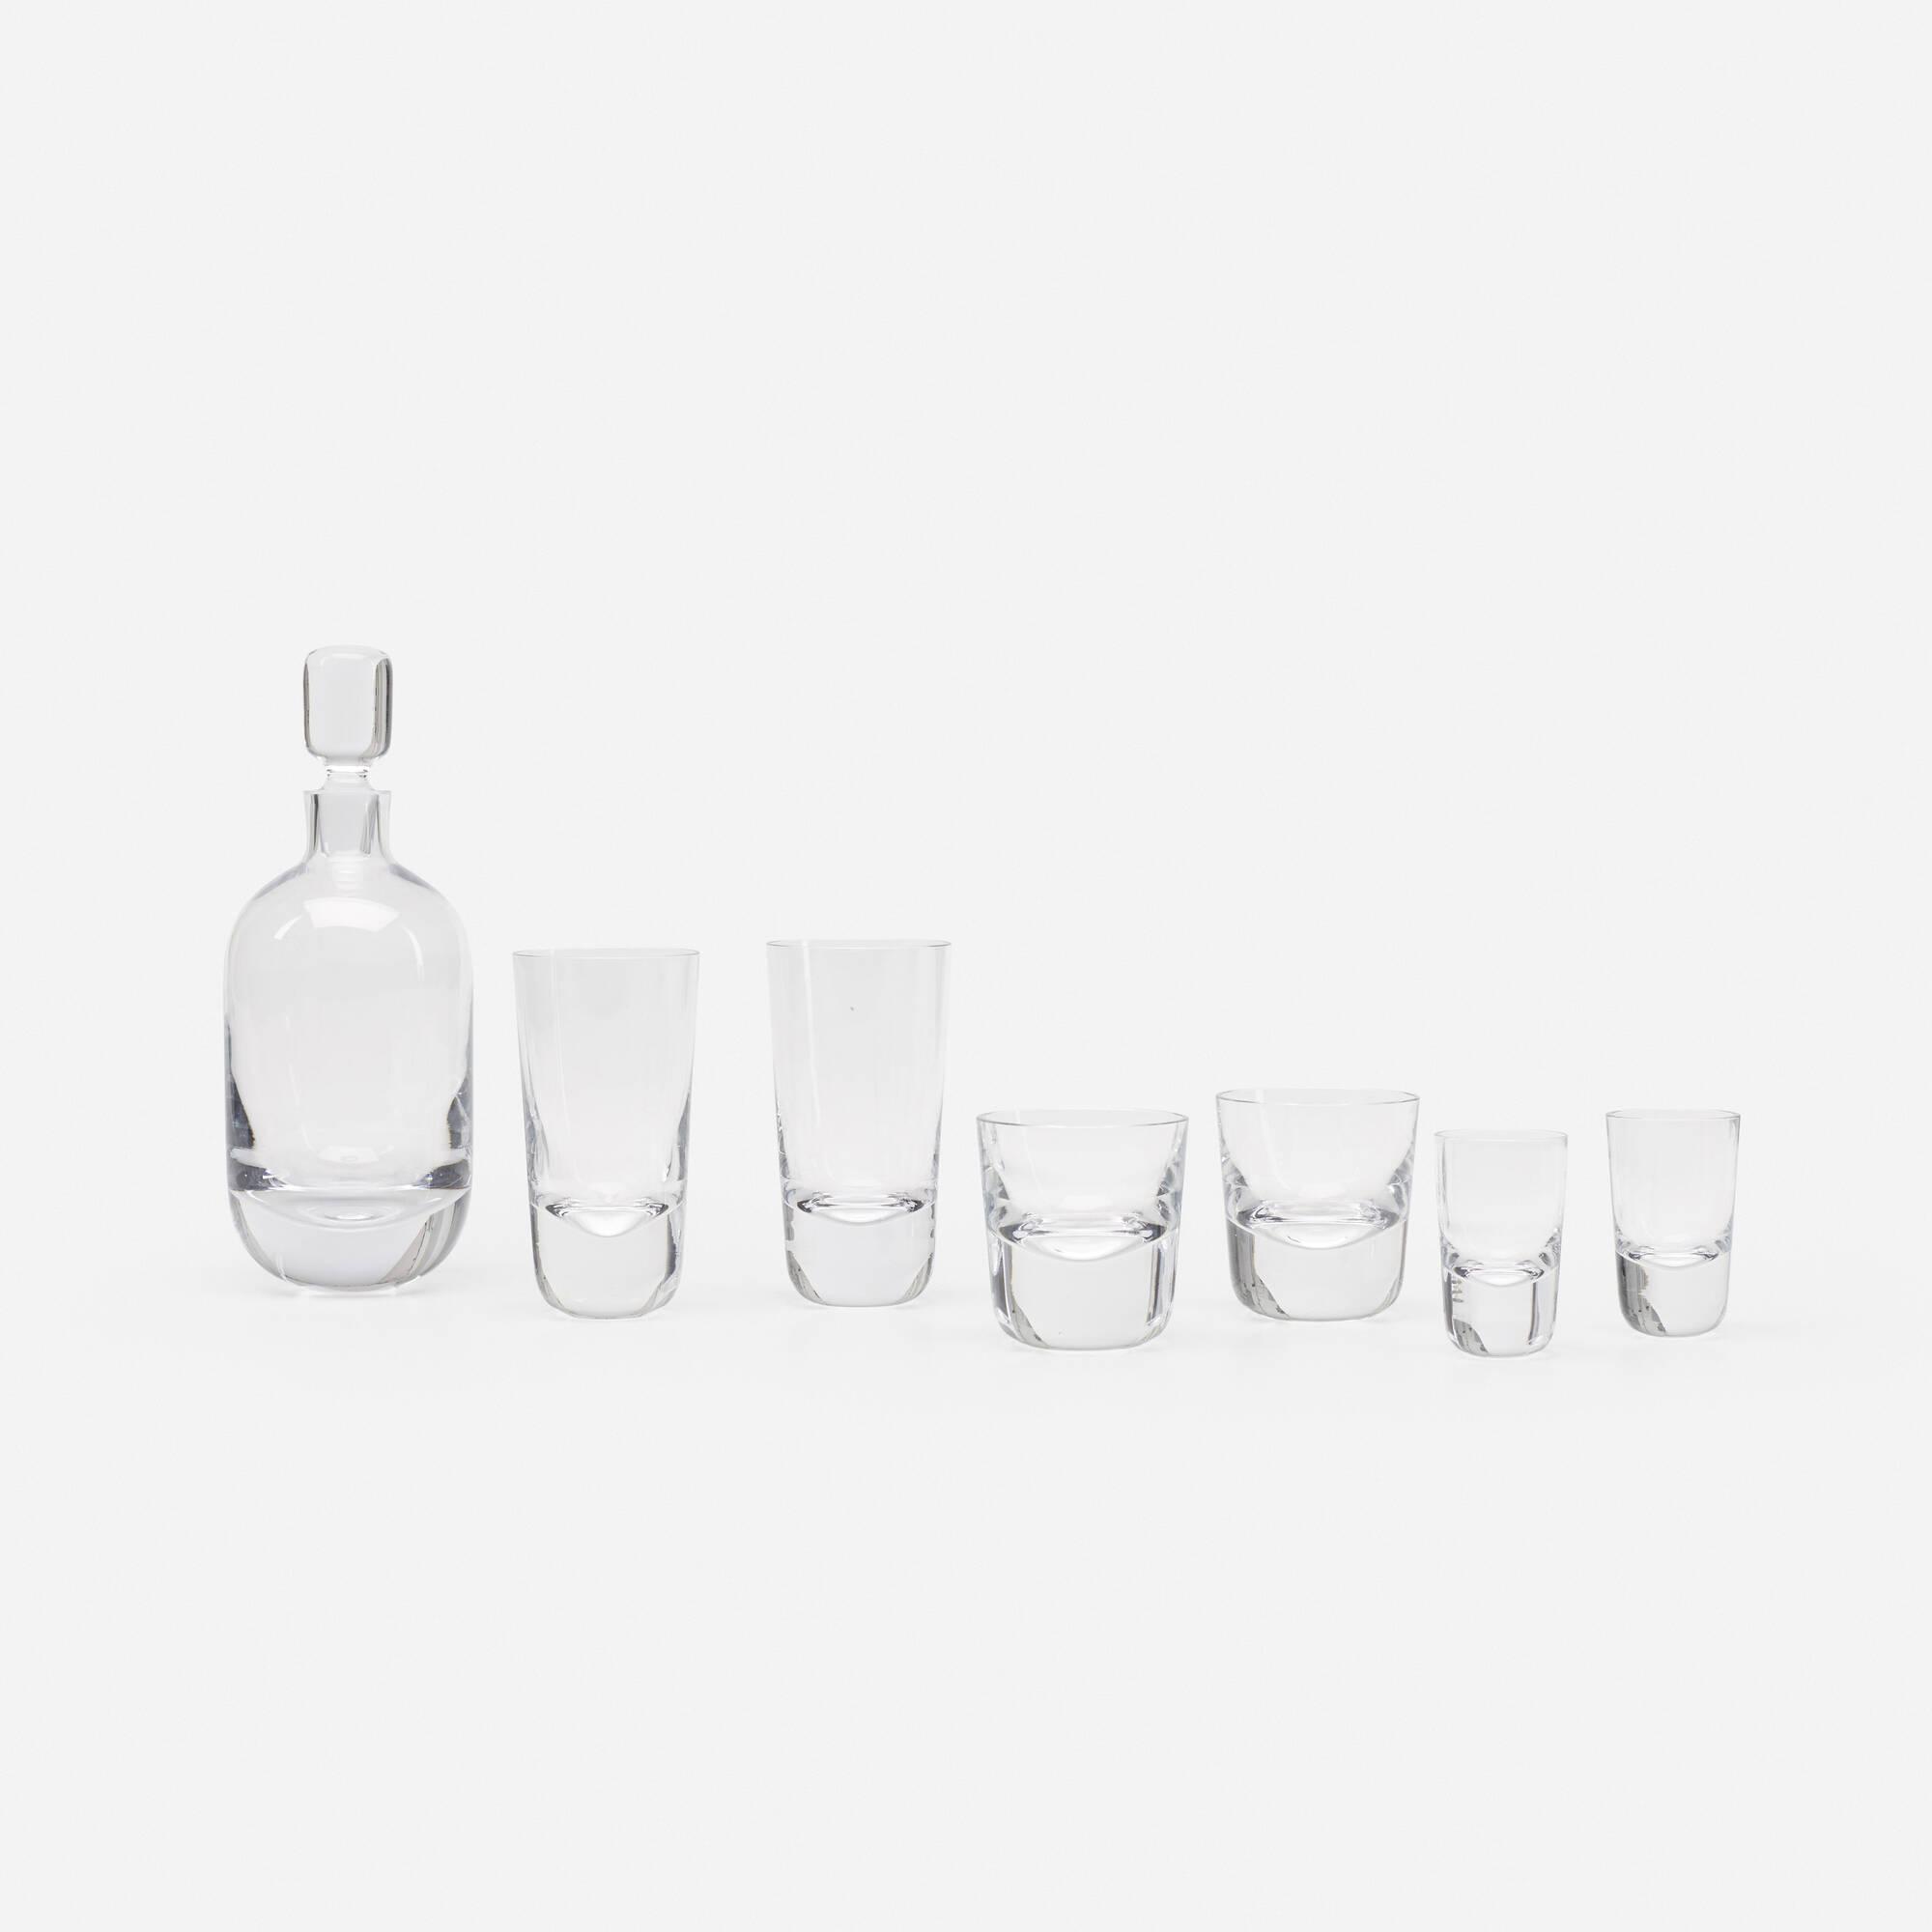 246: Duncan & Miller Glass Co. / glassware set (1 of 2)